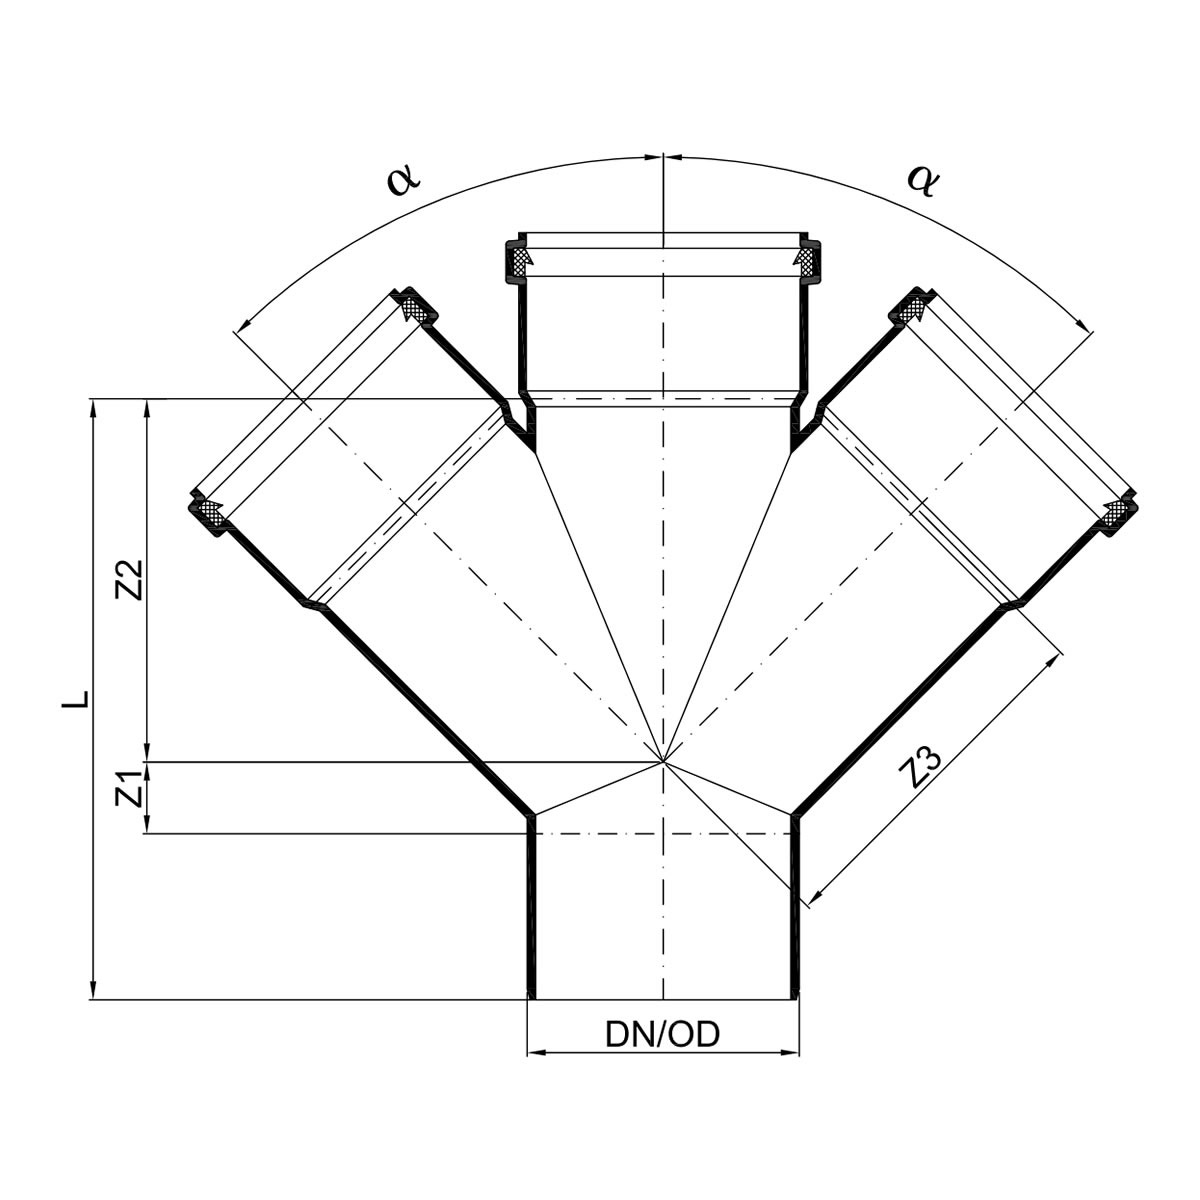 genug POLO-KAL NG Abflussrohr-Doppelabzweig 45° mit Muffen - DN 110 AT79